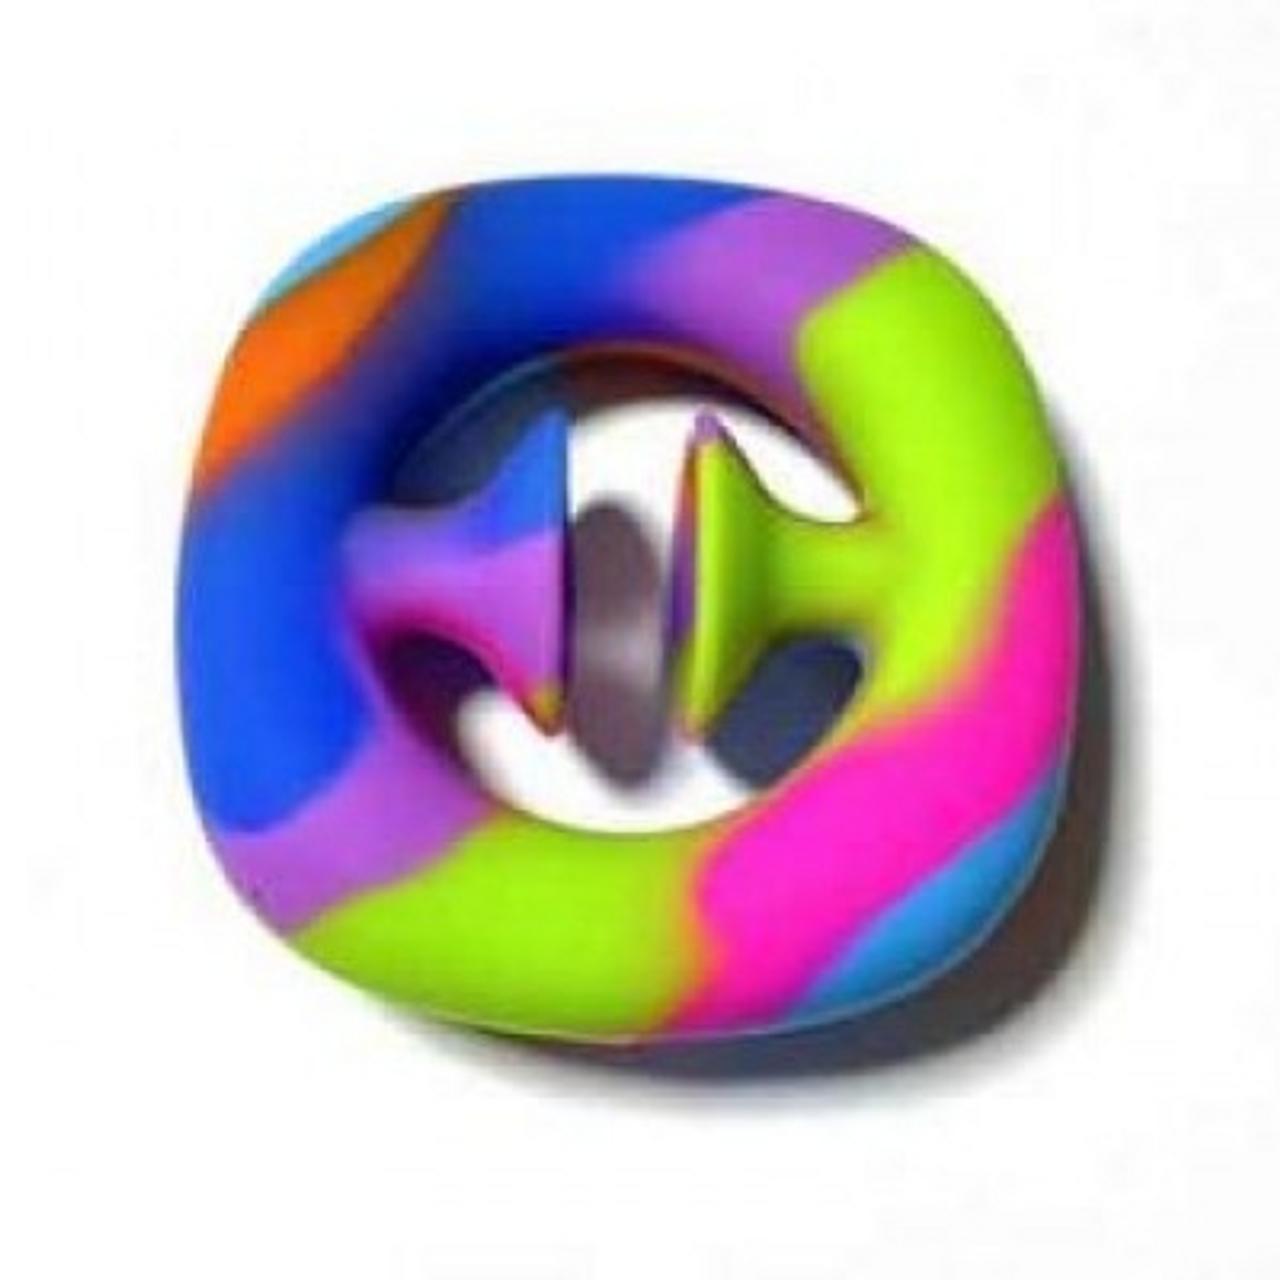 Snap & Pop Fidget Toy Rainbow